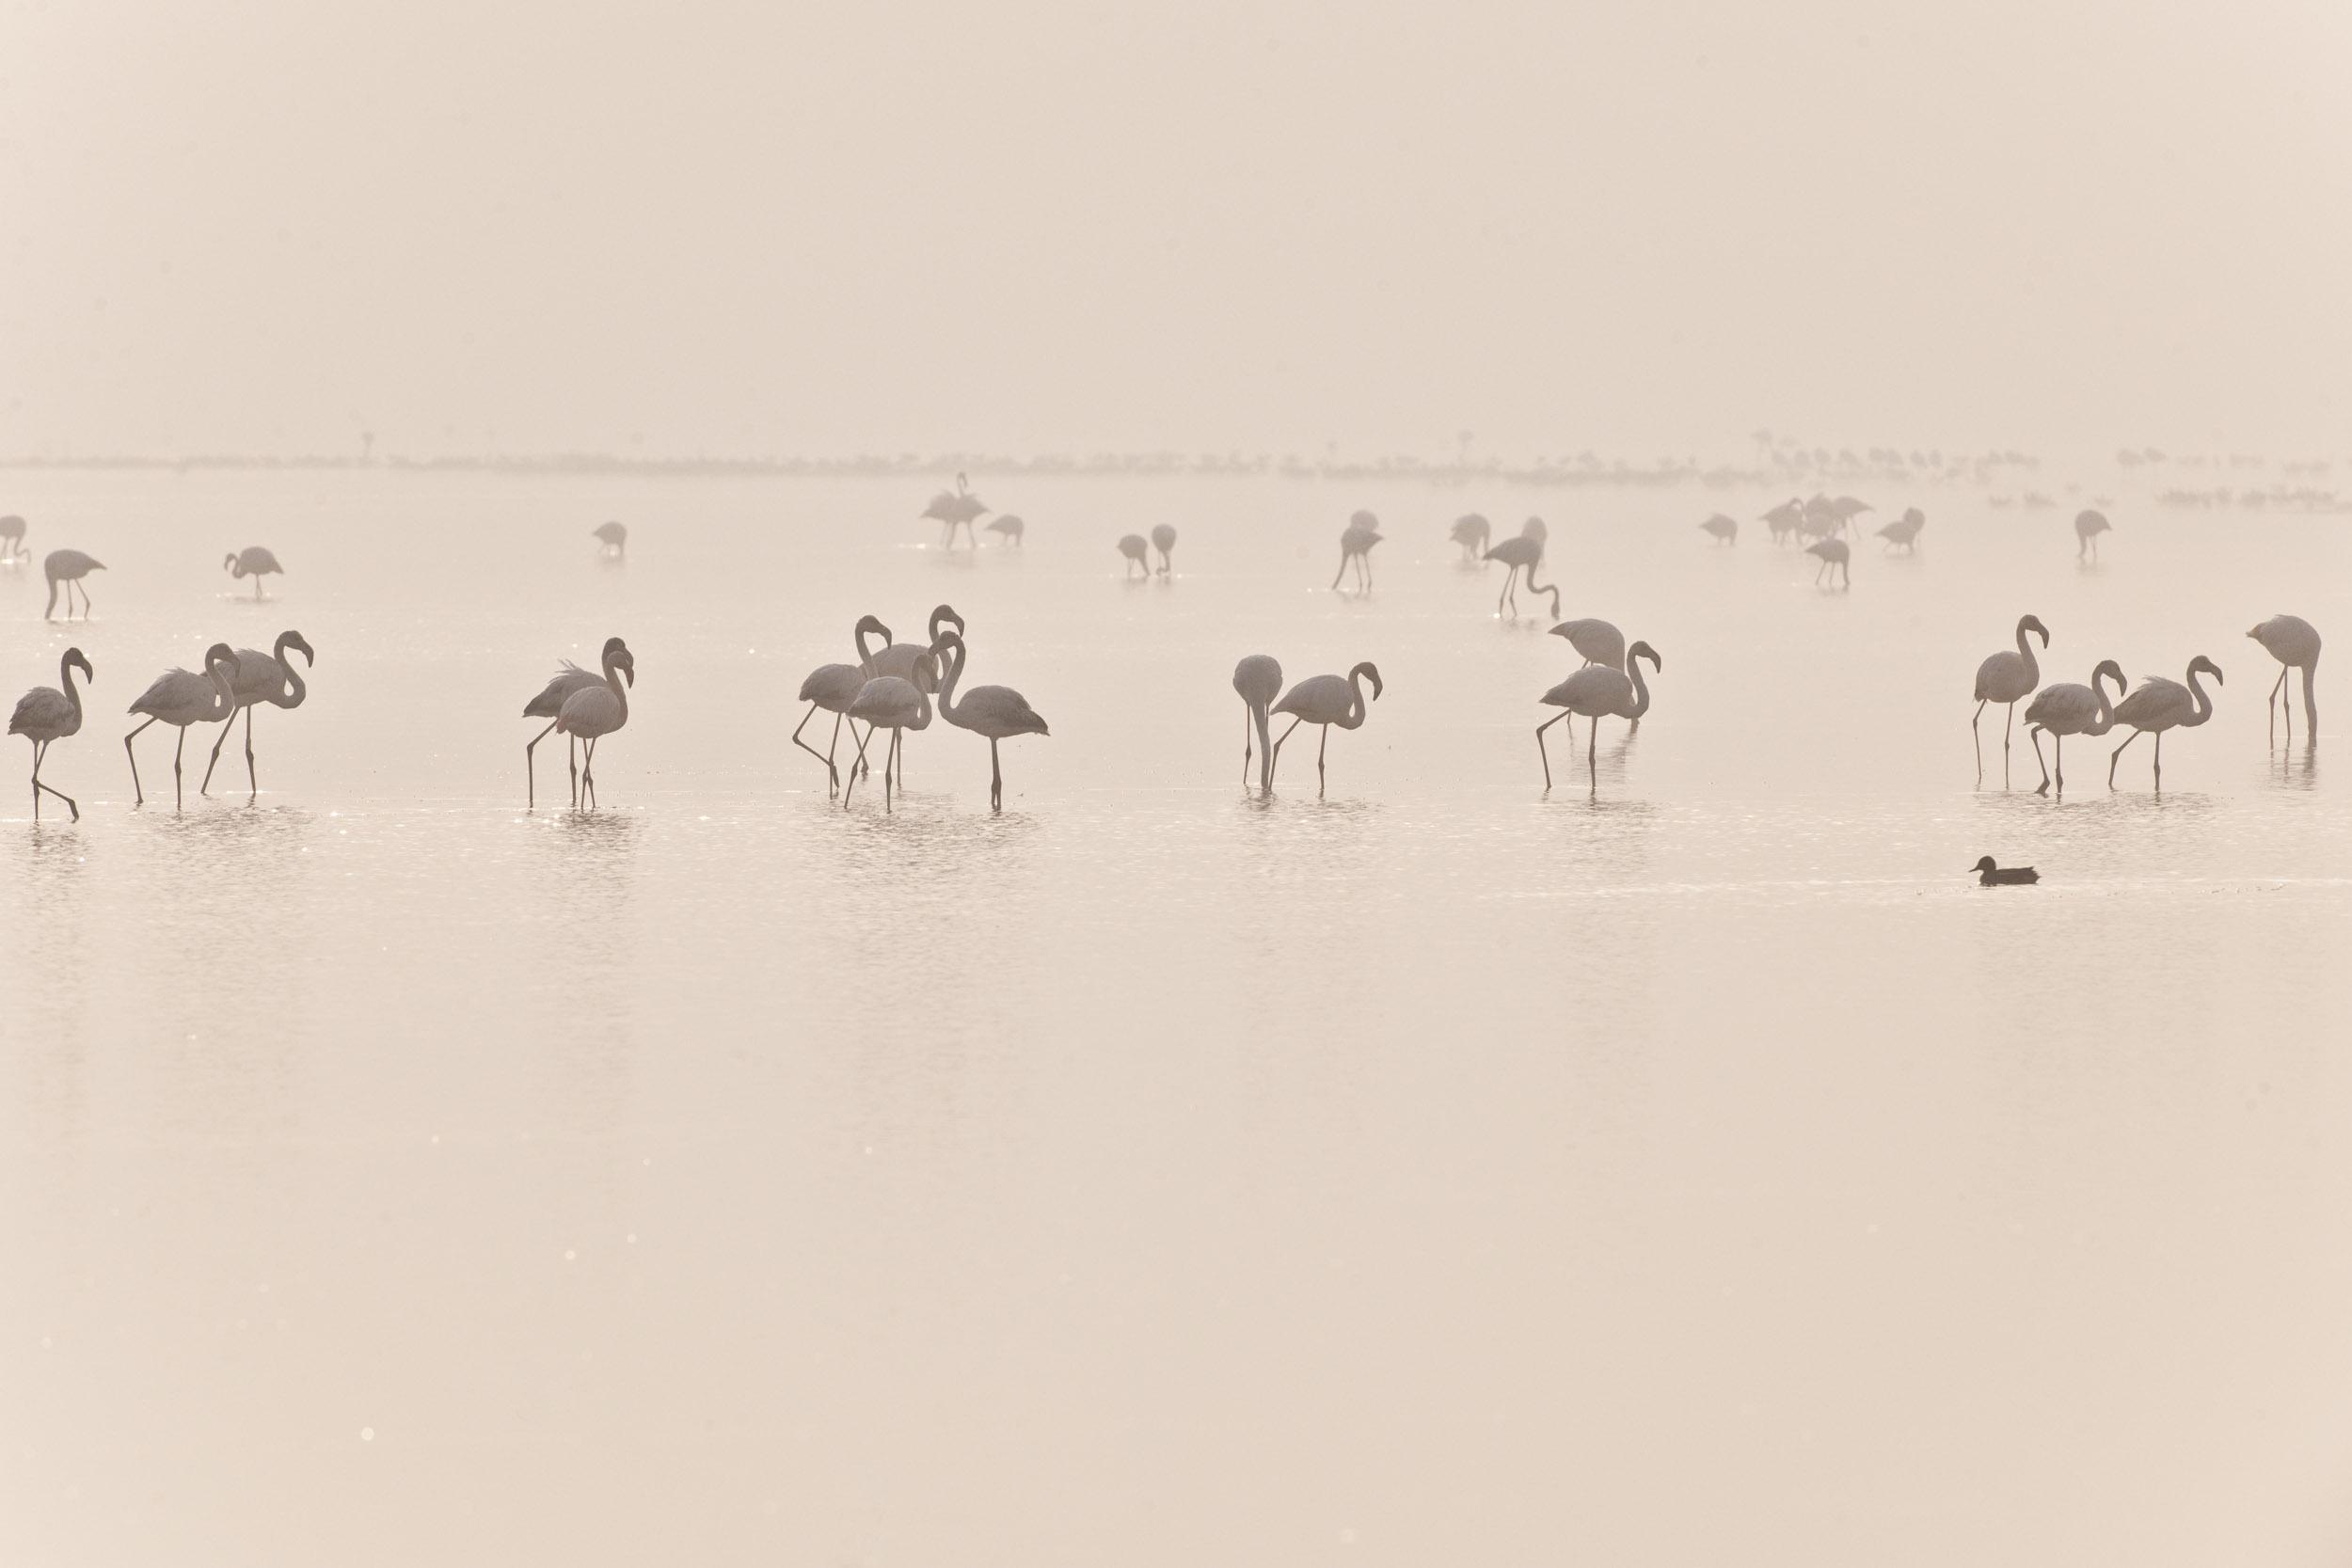 Gaia - Hector Garrido, Aerial and human photography